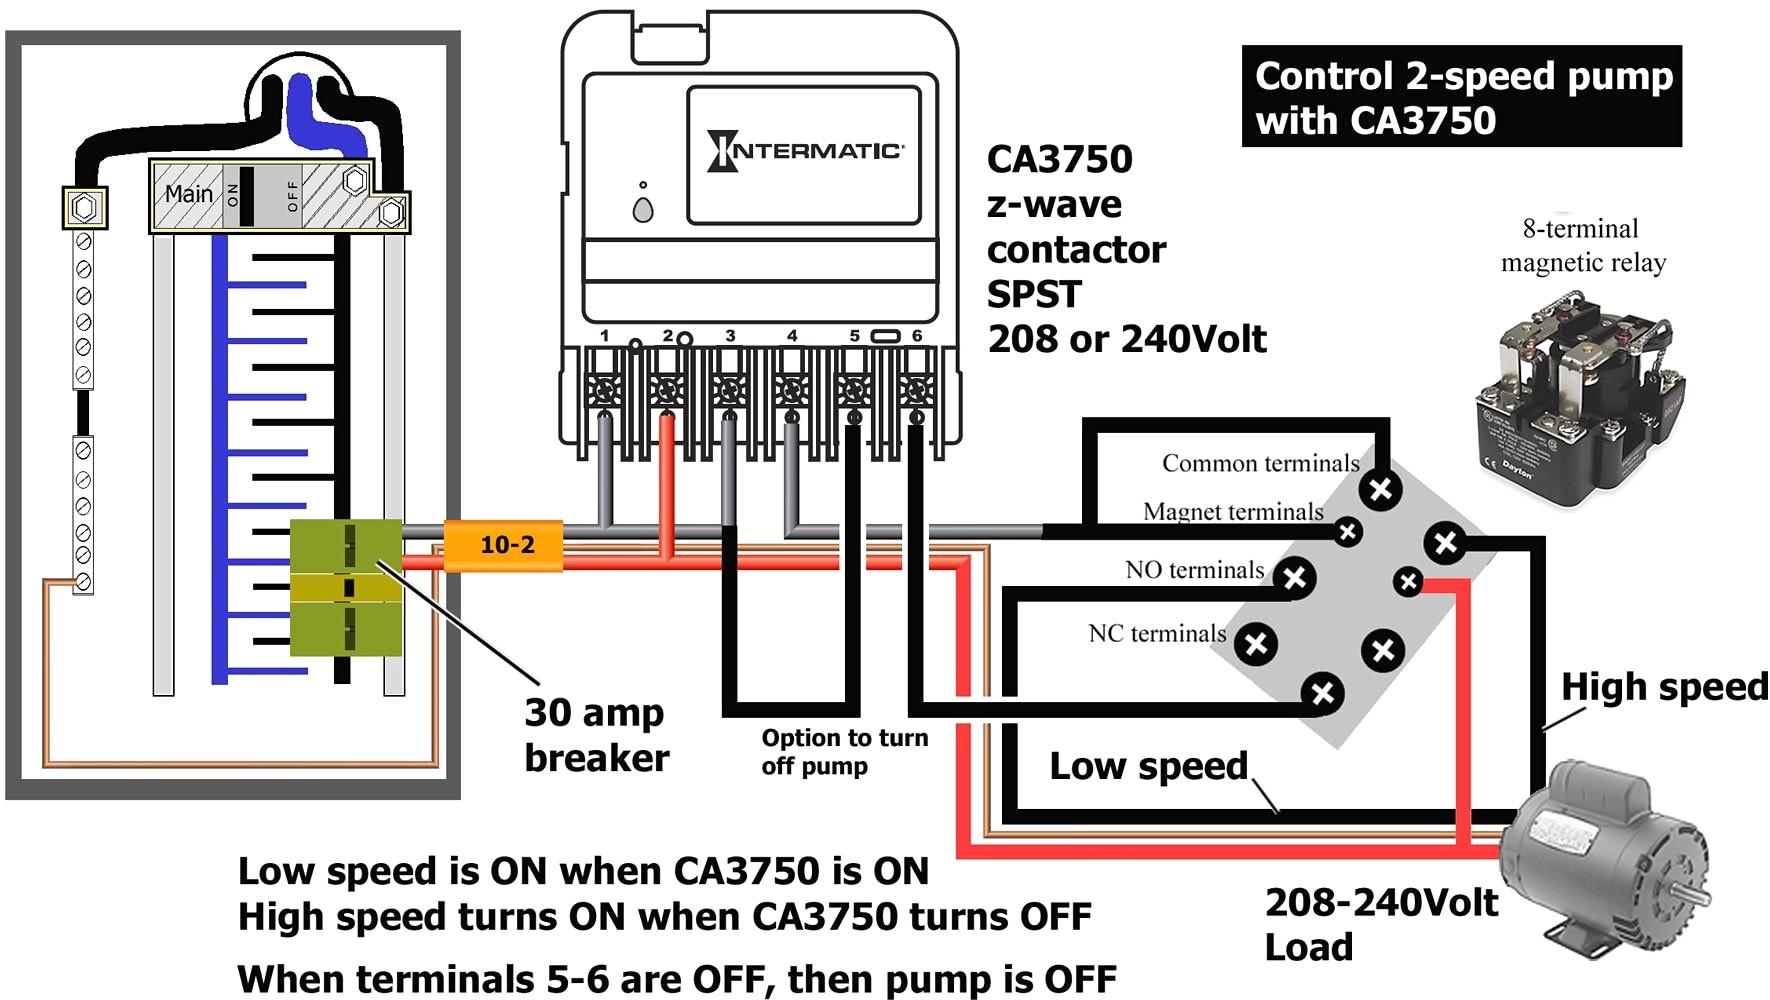 208 lighting wiring diagram xf 6647  pole contactor wiring diagram control free download  pole contactor wiring diagram control